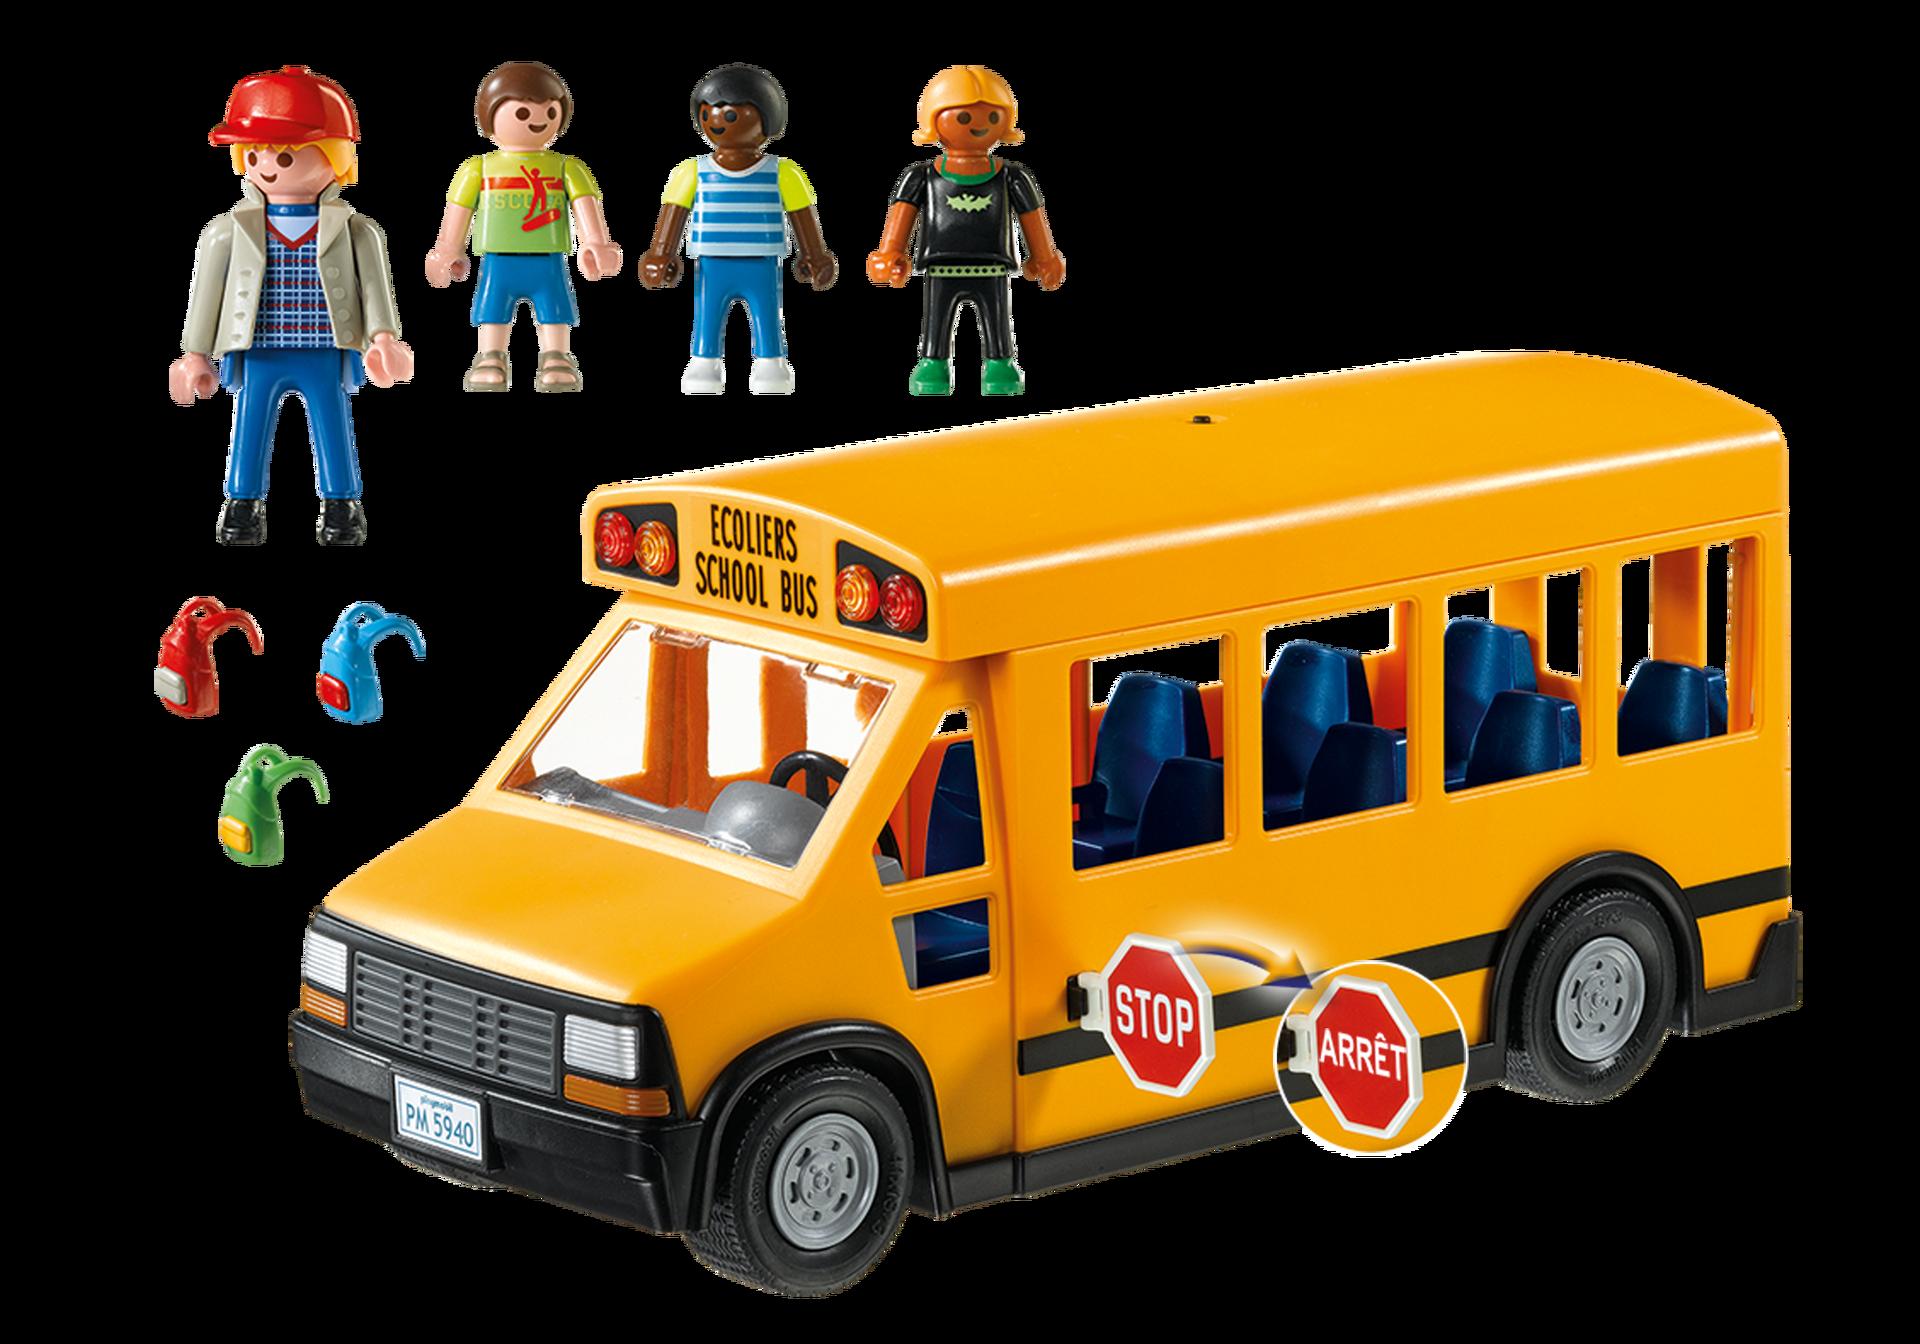 school bus 5680 playmobil canada. Black Bedroom Furniture Sets. Home Design Ideas